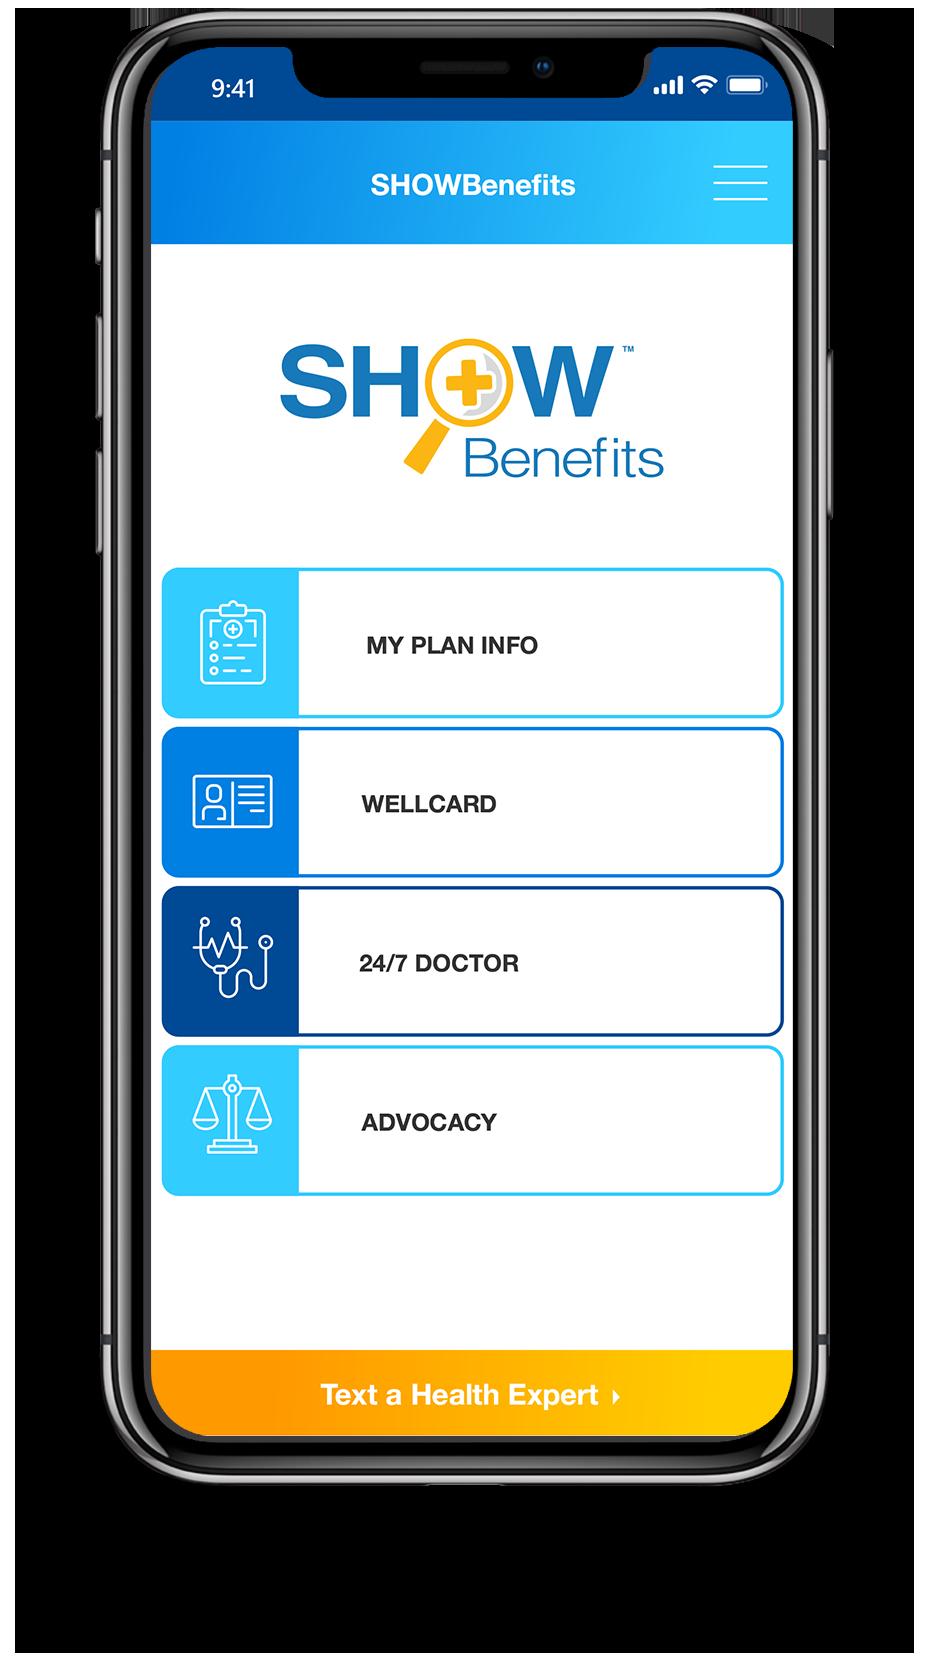 SHOWBenefits Phone Application Home Screen